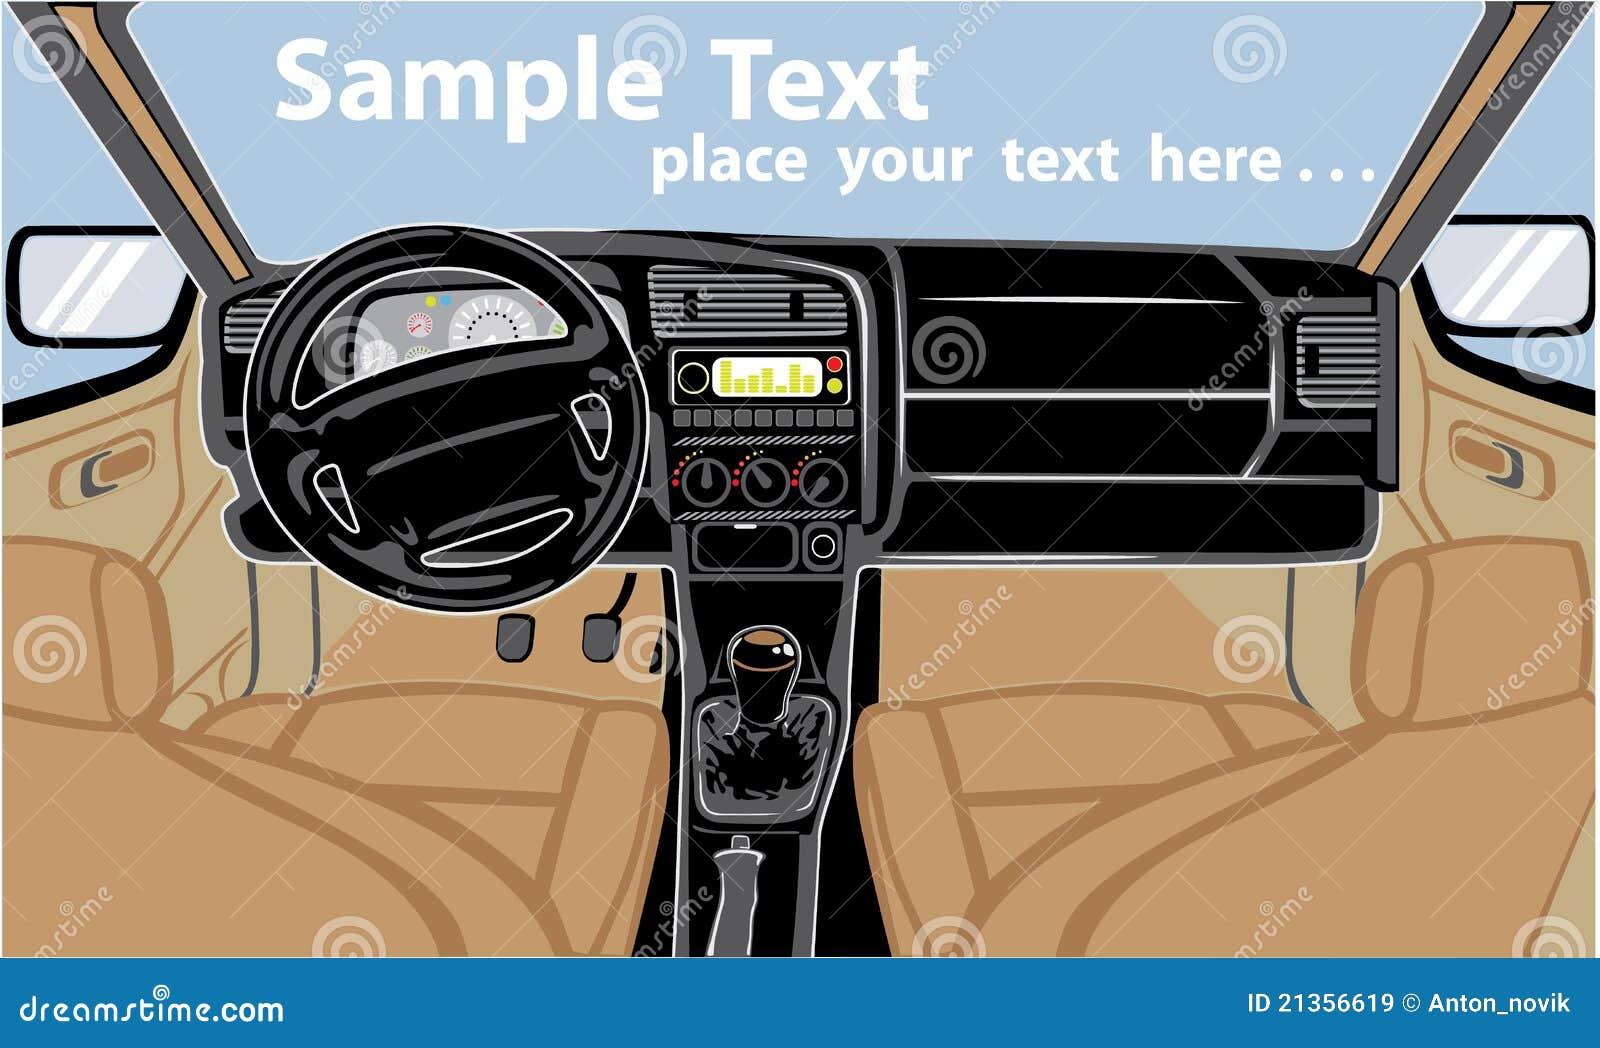 car interior royalty free stock images image 21356619. Black Bedroom Furniture Sets. Home Design Ideas